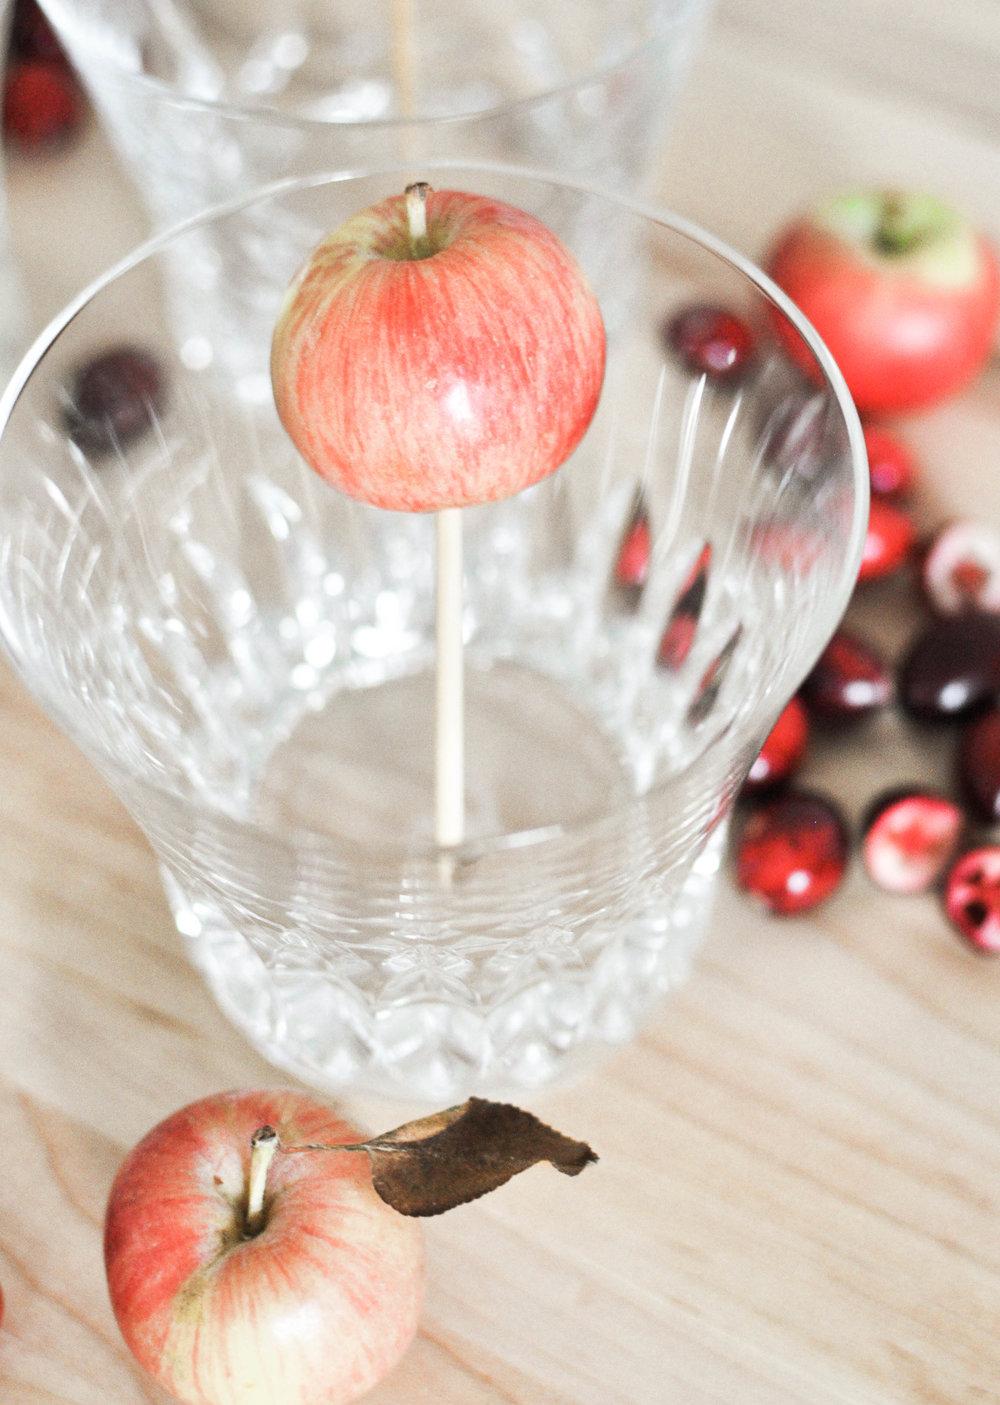 ThanksgivingCocktail-4.jpg